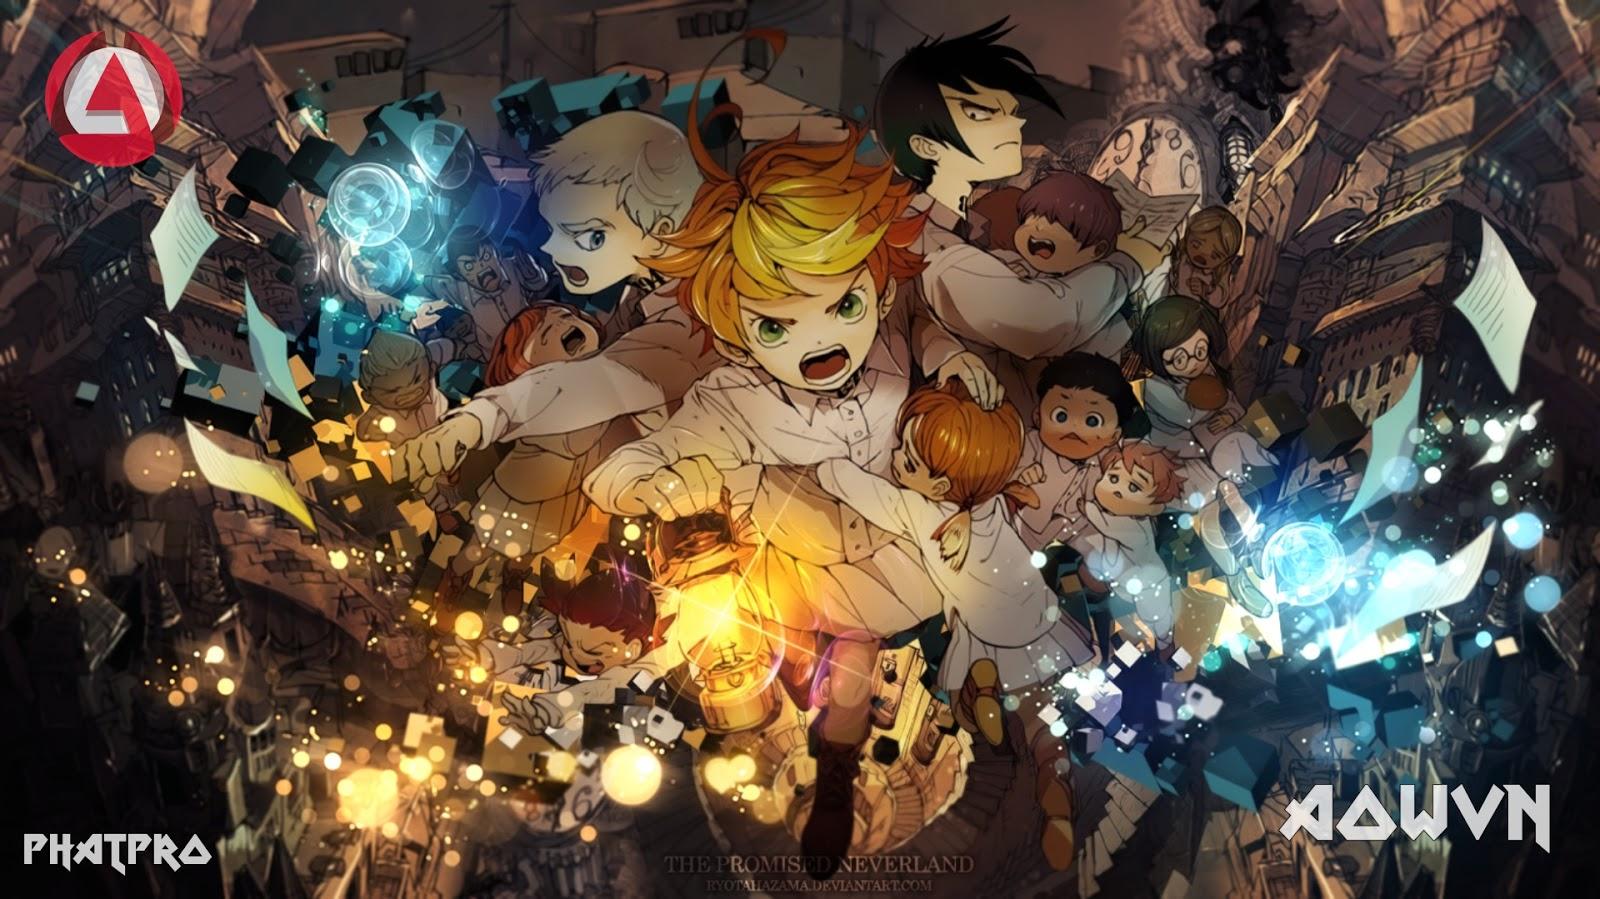 Yalusoku%2B %2BPhatpro%2B%25283%2529 - [ Anime 3gp Mp4 ] Yakusoku No Neverland | Vietsub - Siêu Phẩm - Gay Cấn Từng Giây! - Max Hay